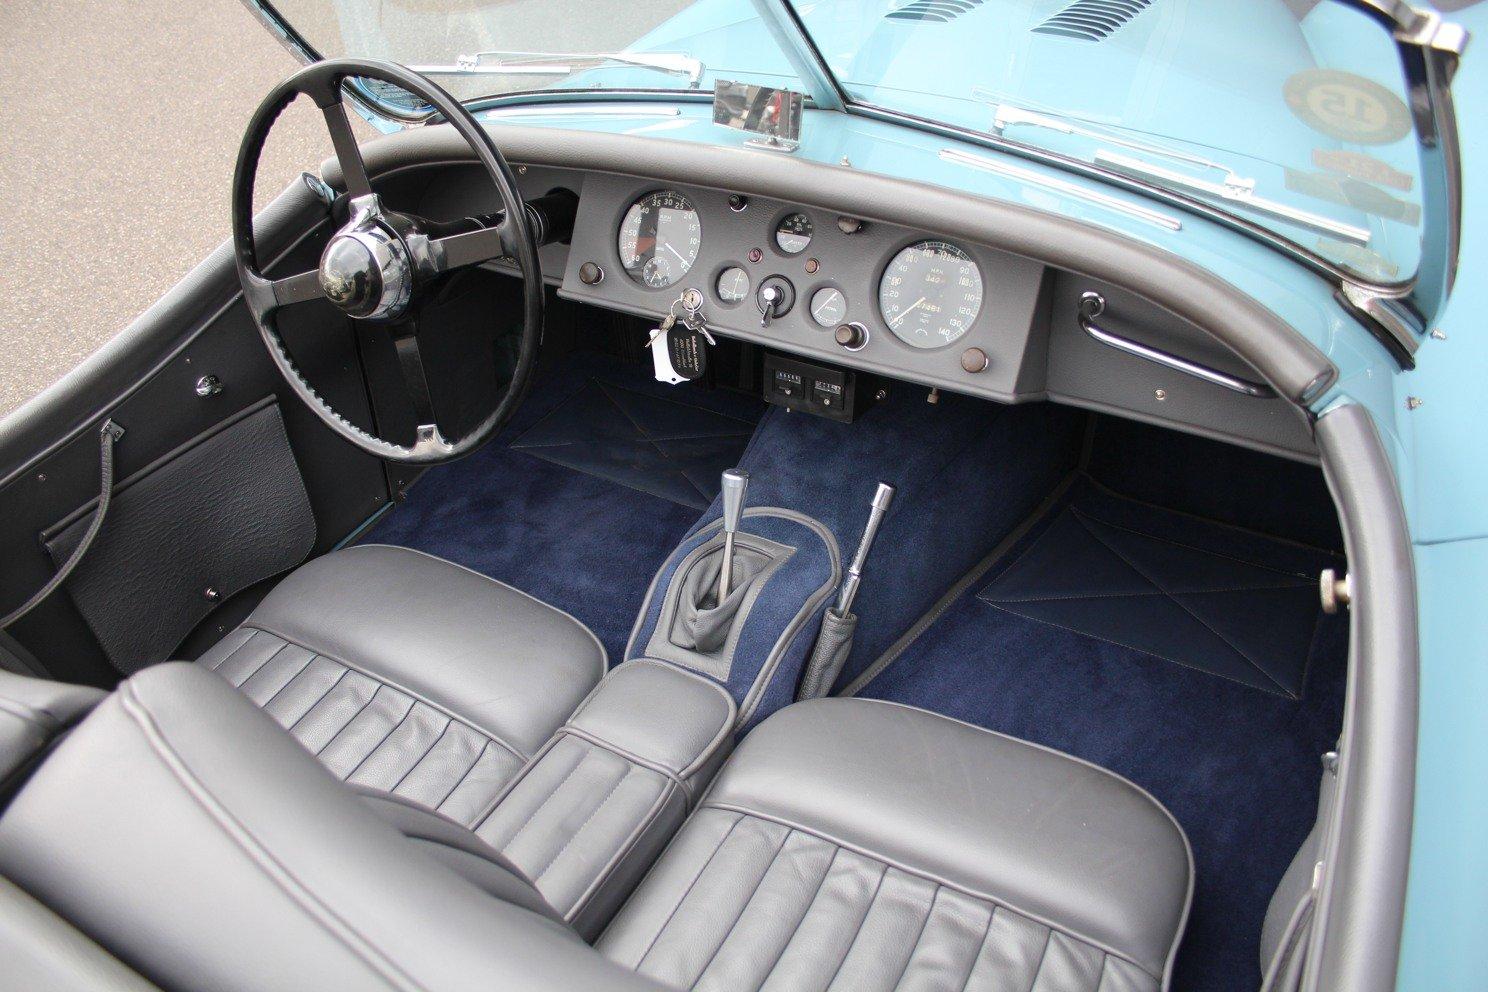 1953 Jaguar XK 120 SE Roadster LHD  For Sale (picture 3 of 6)